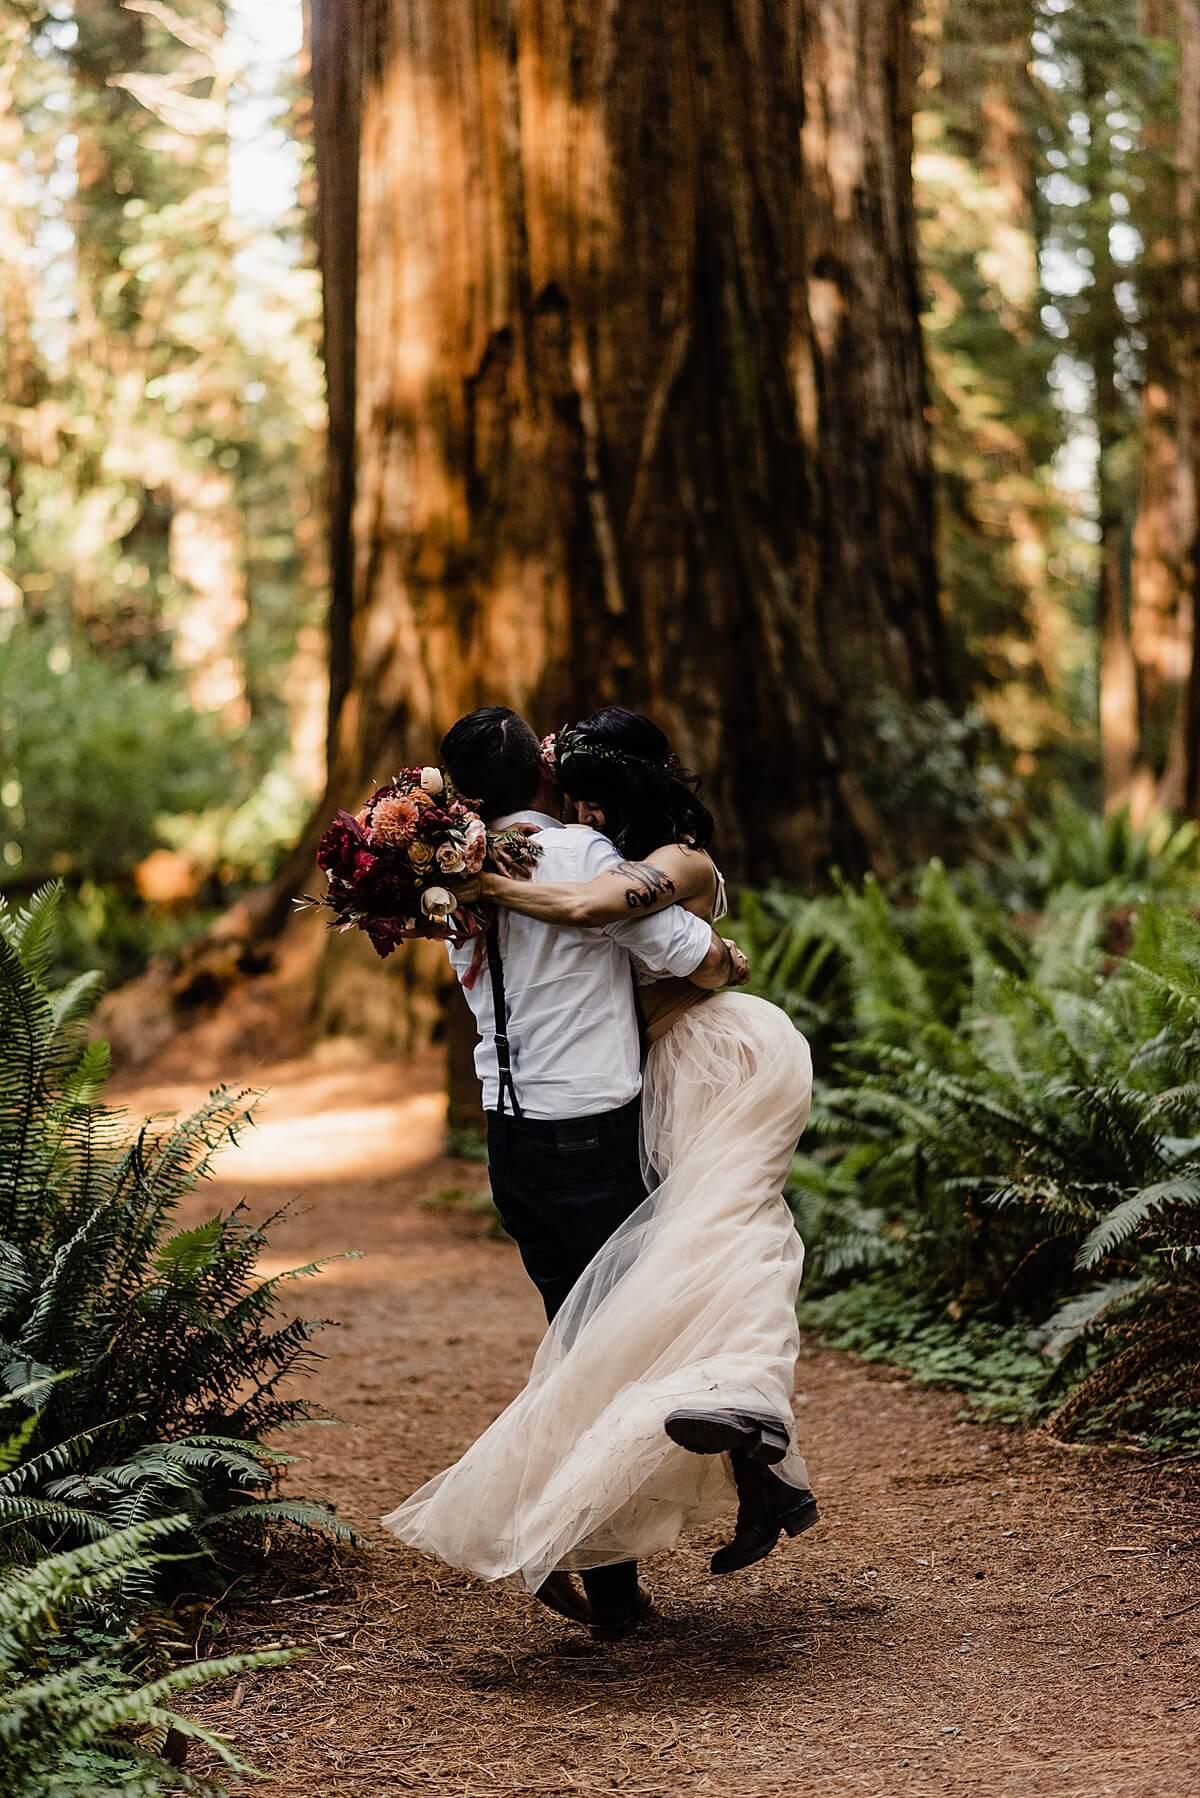 Allison-Brooks-Jedediah-Smiith-Redwoods-Adventure-Elopement-Wedding-S-Photography-Blog_0034.jpg